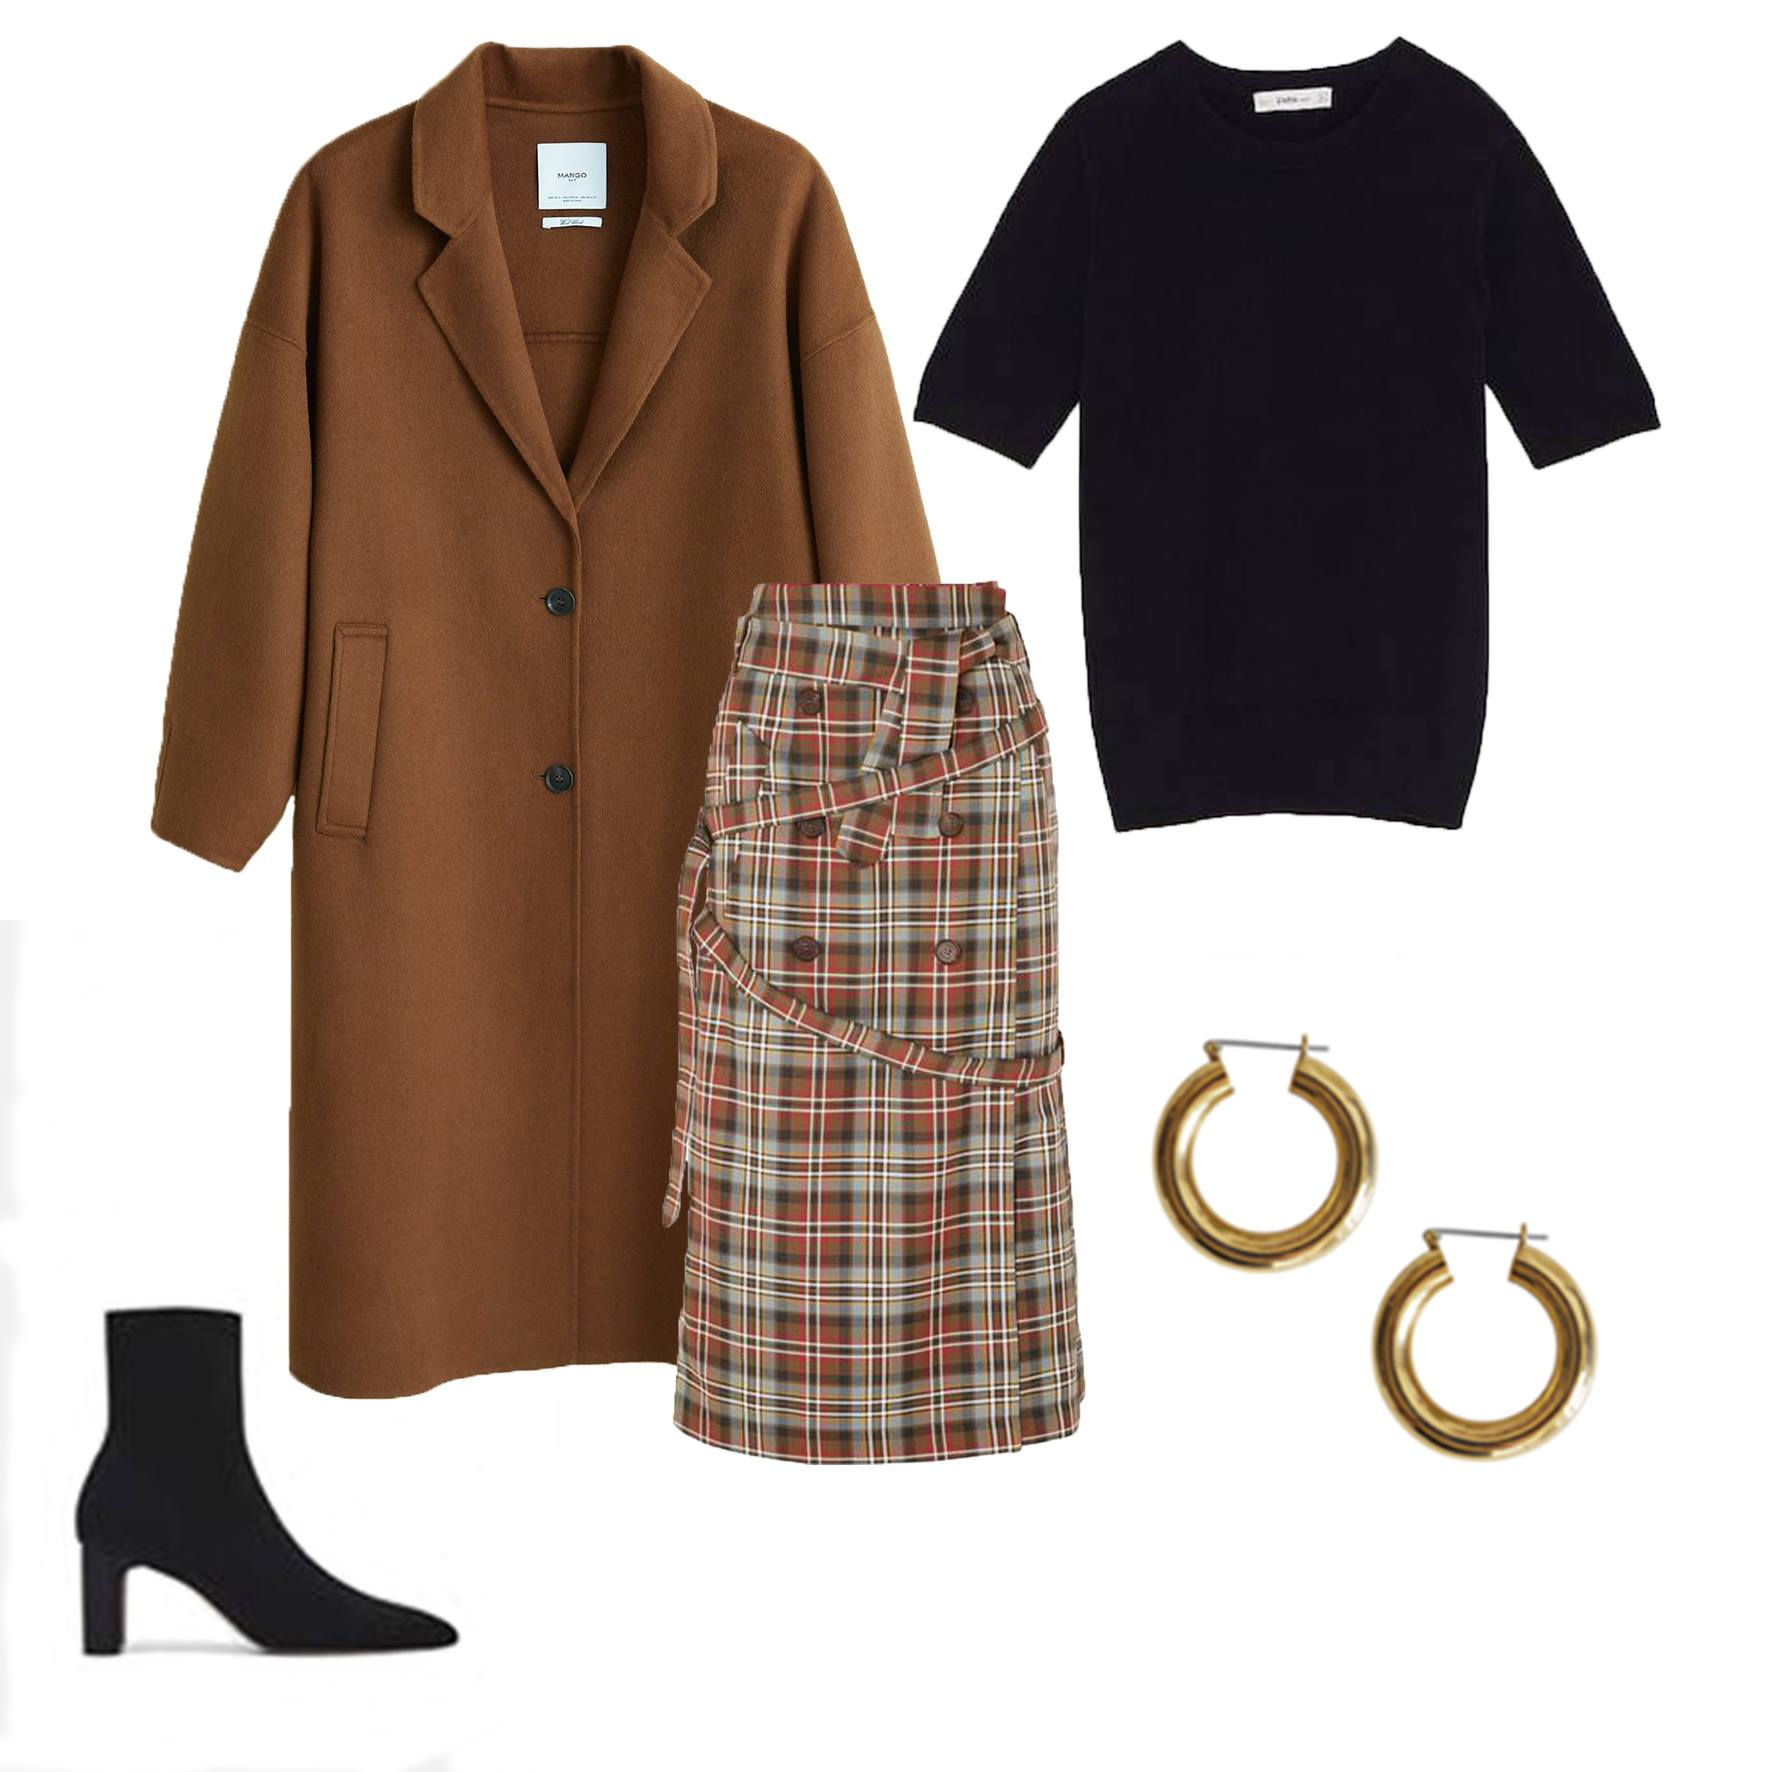 jesenski outfit